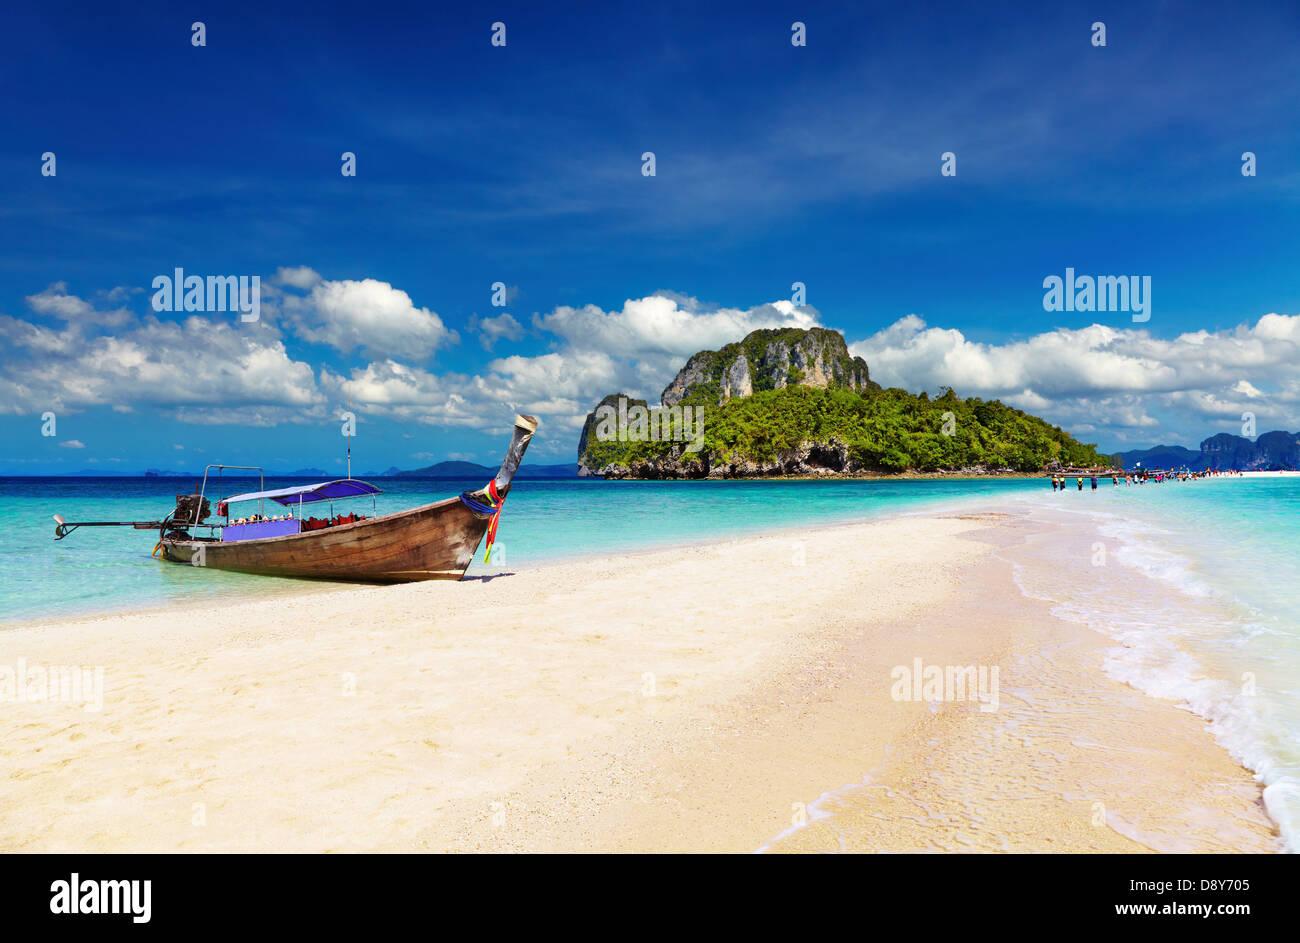 Tropical beach, Tub Island, Andaman Sea, Thailand - Stock Image